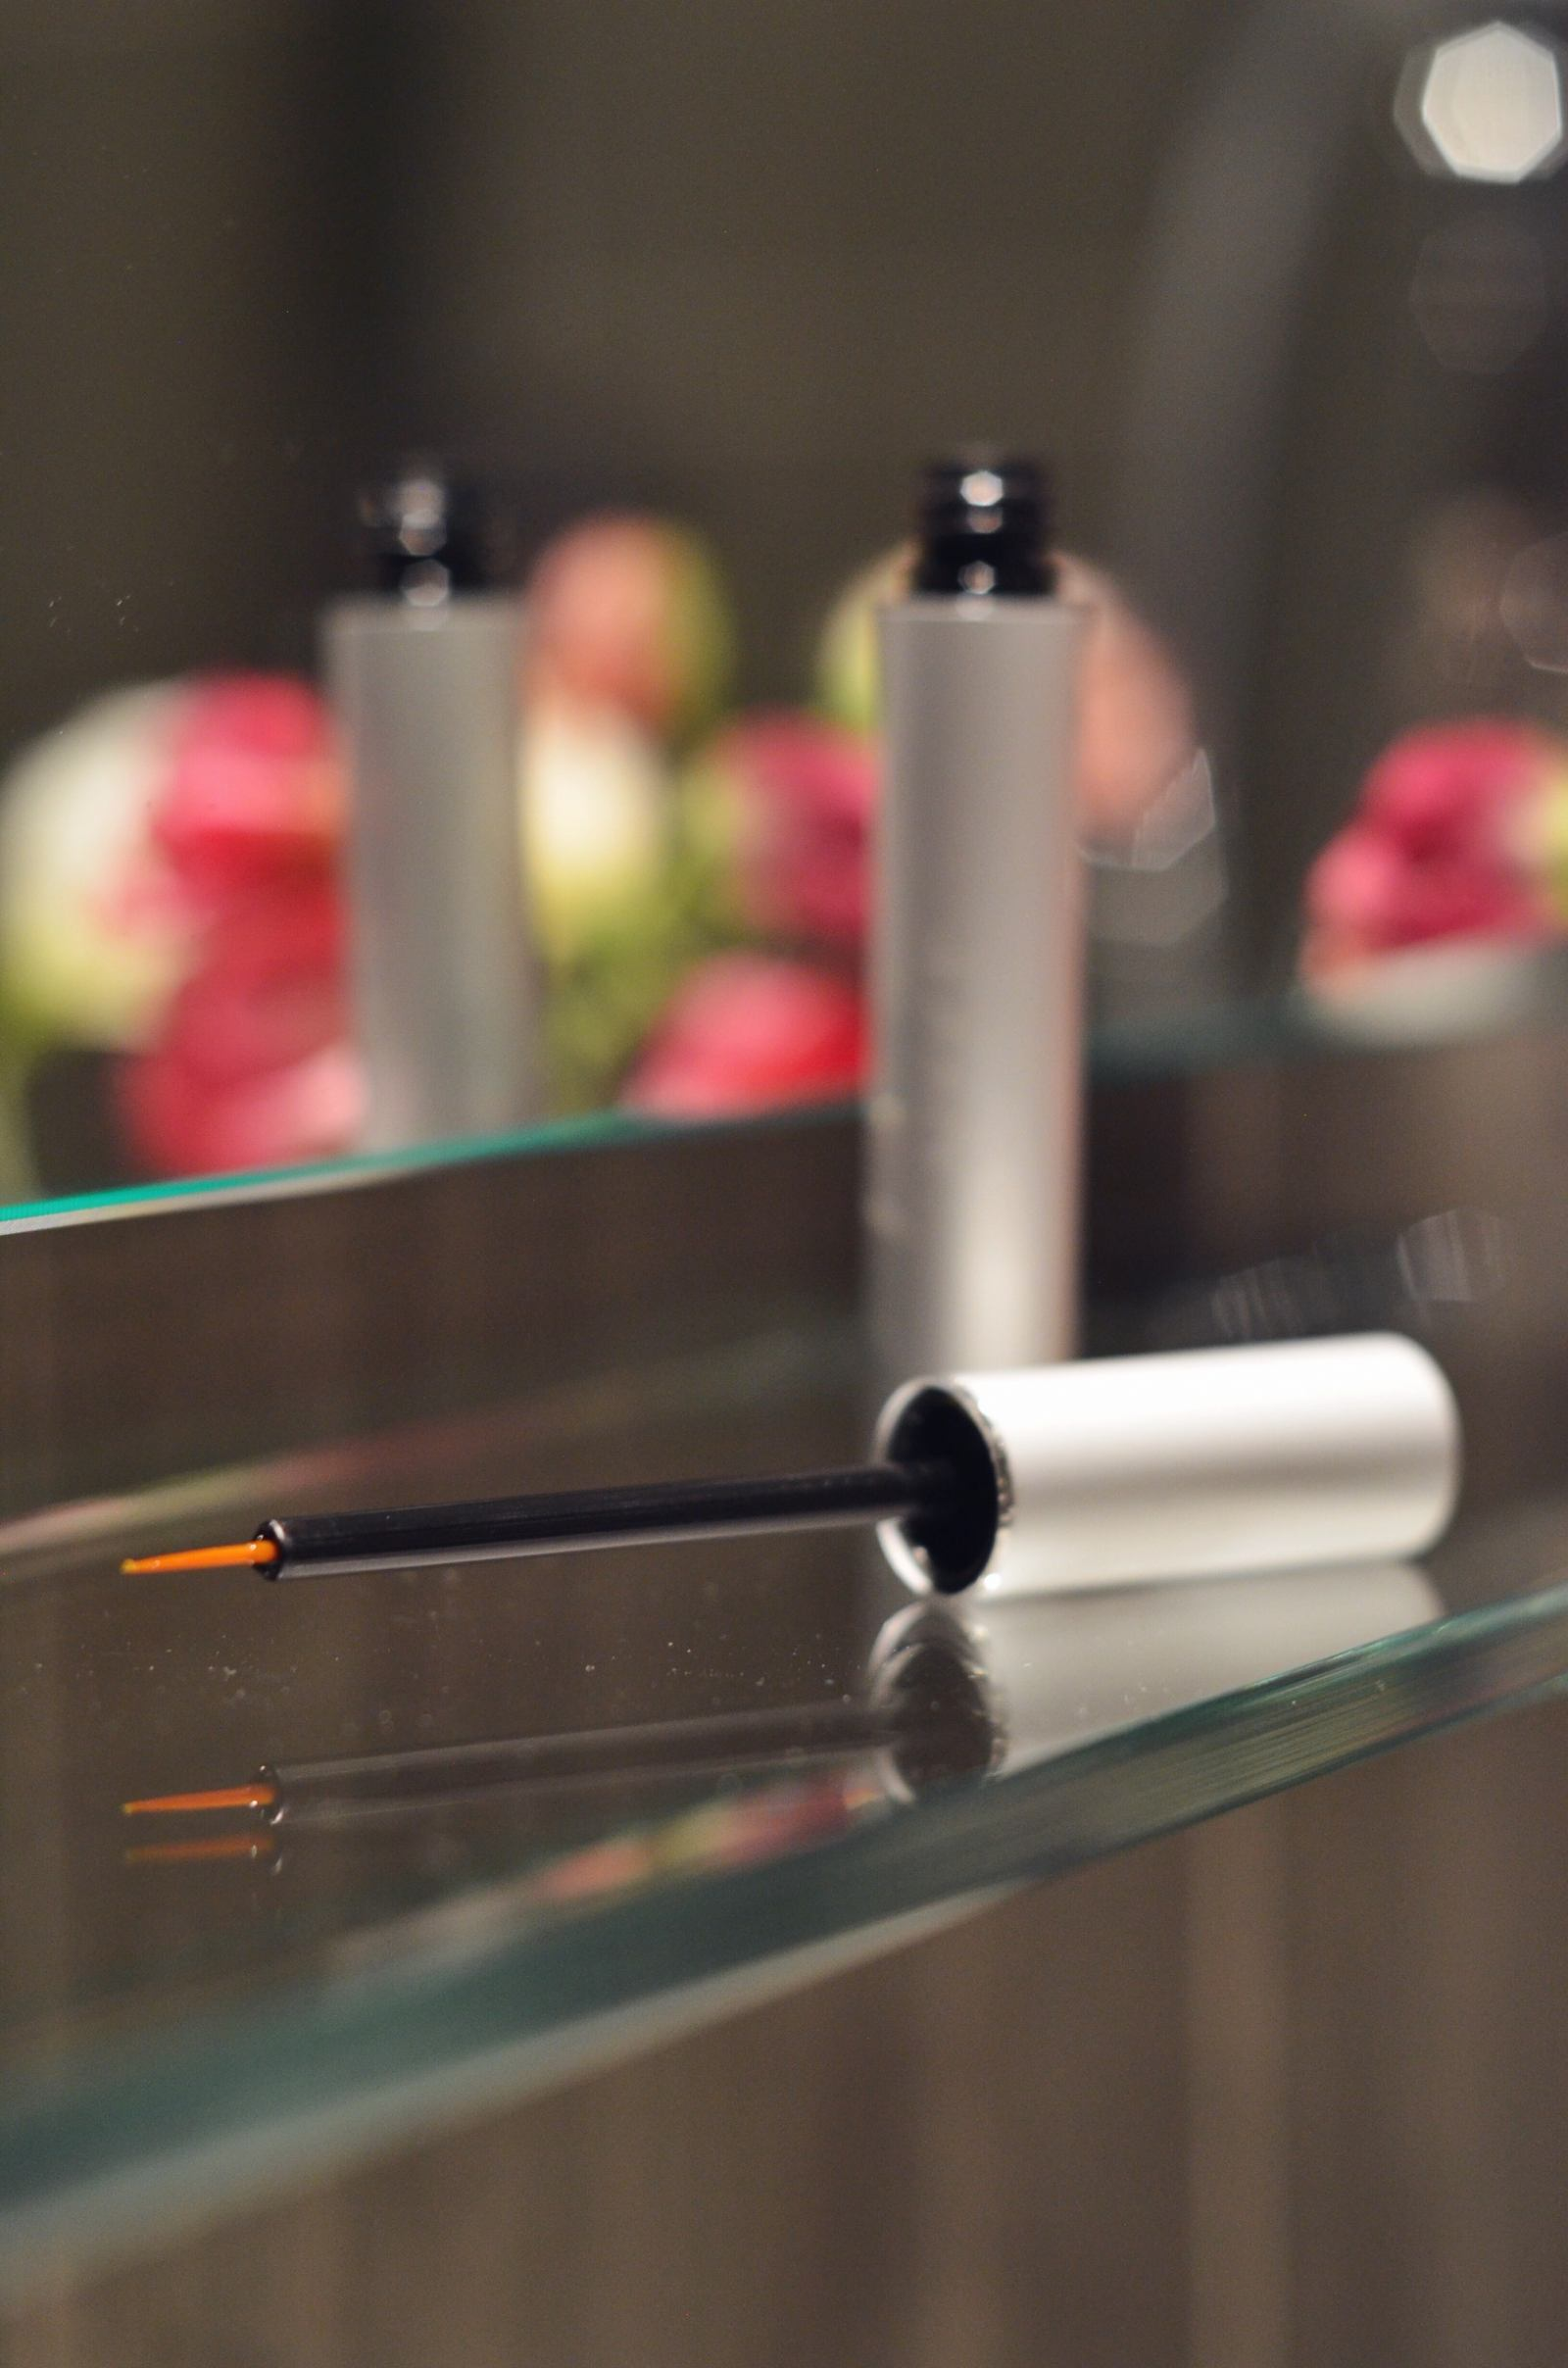 nyk1-lash-serum-review